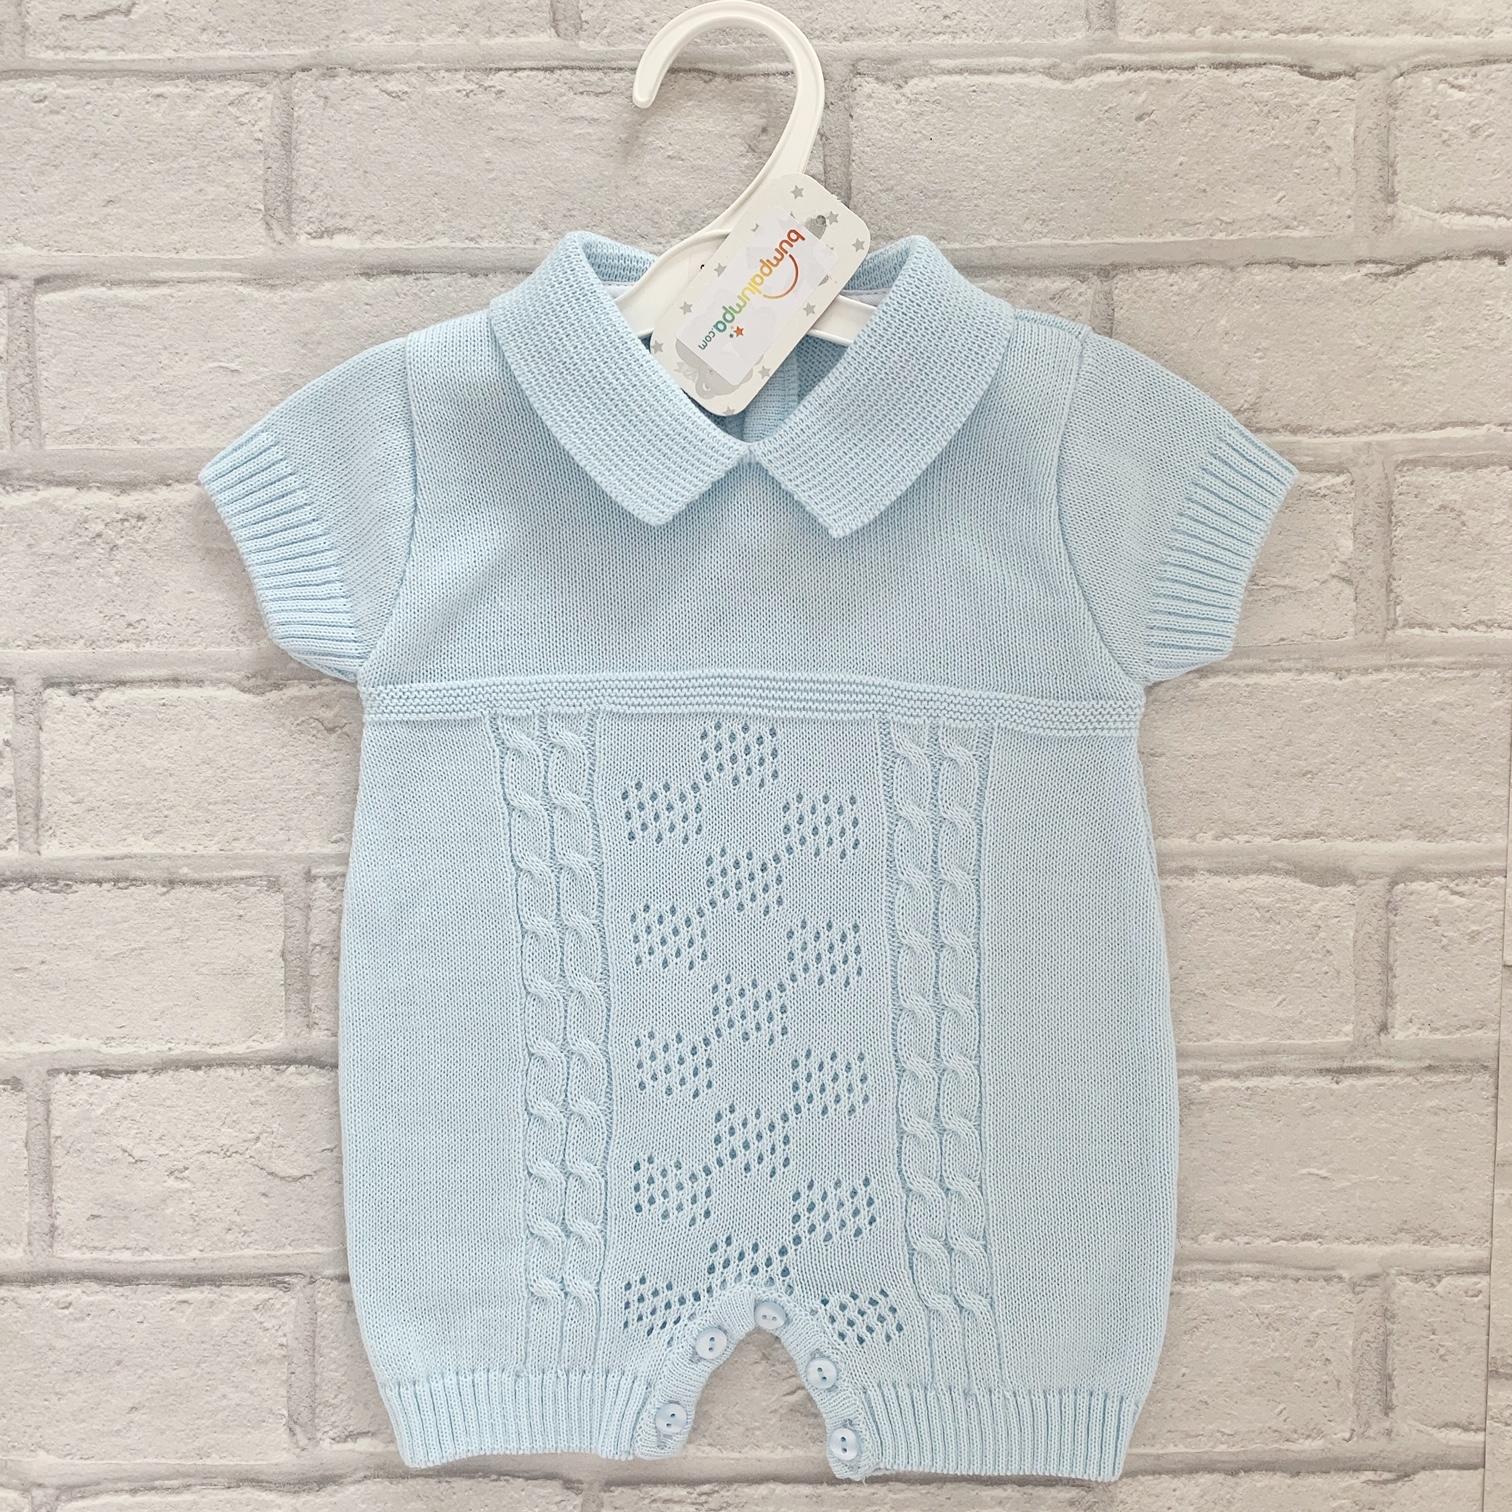 36df9b98 Blue Baby Boys Romper Suit